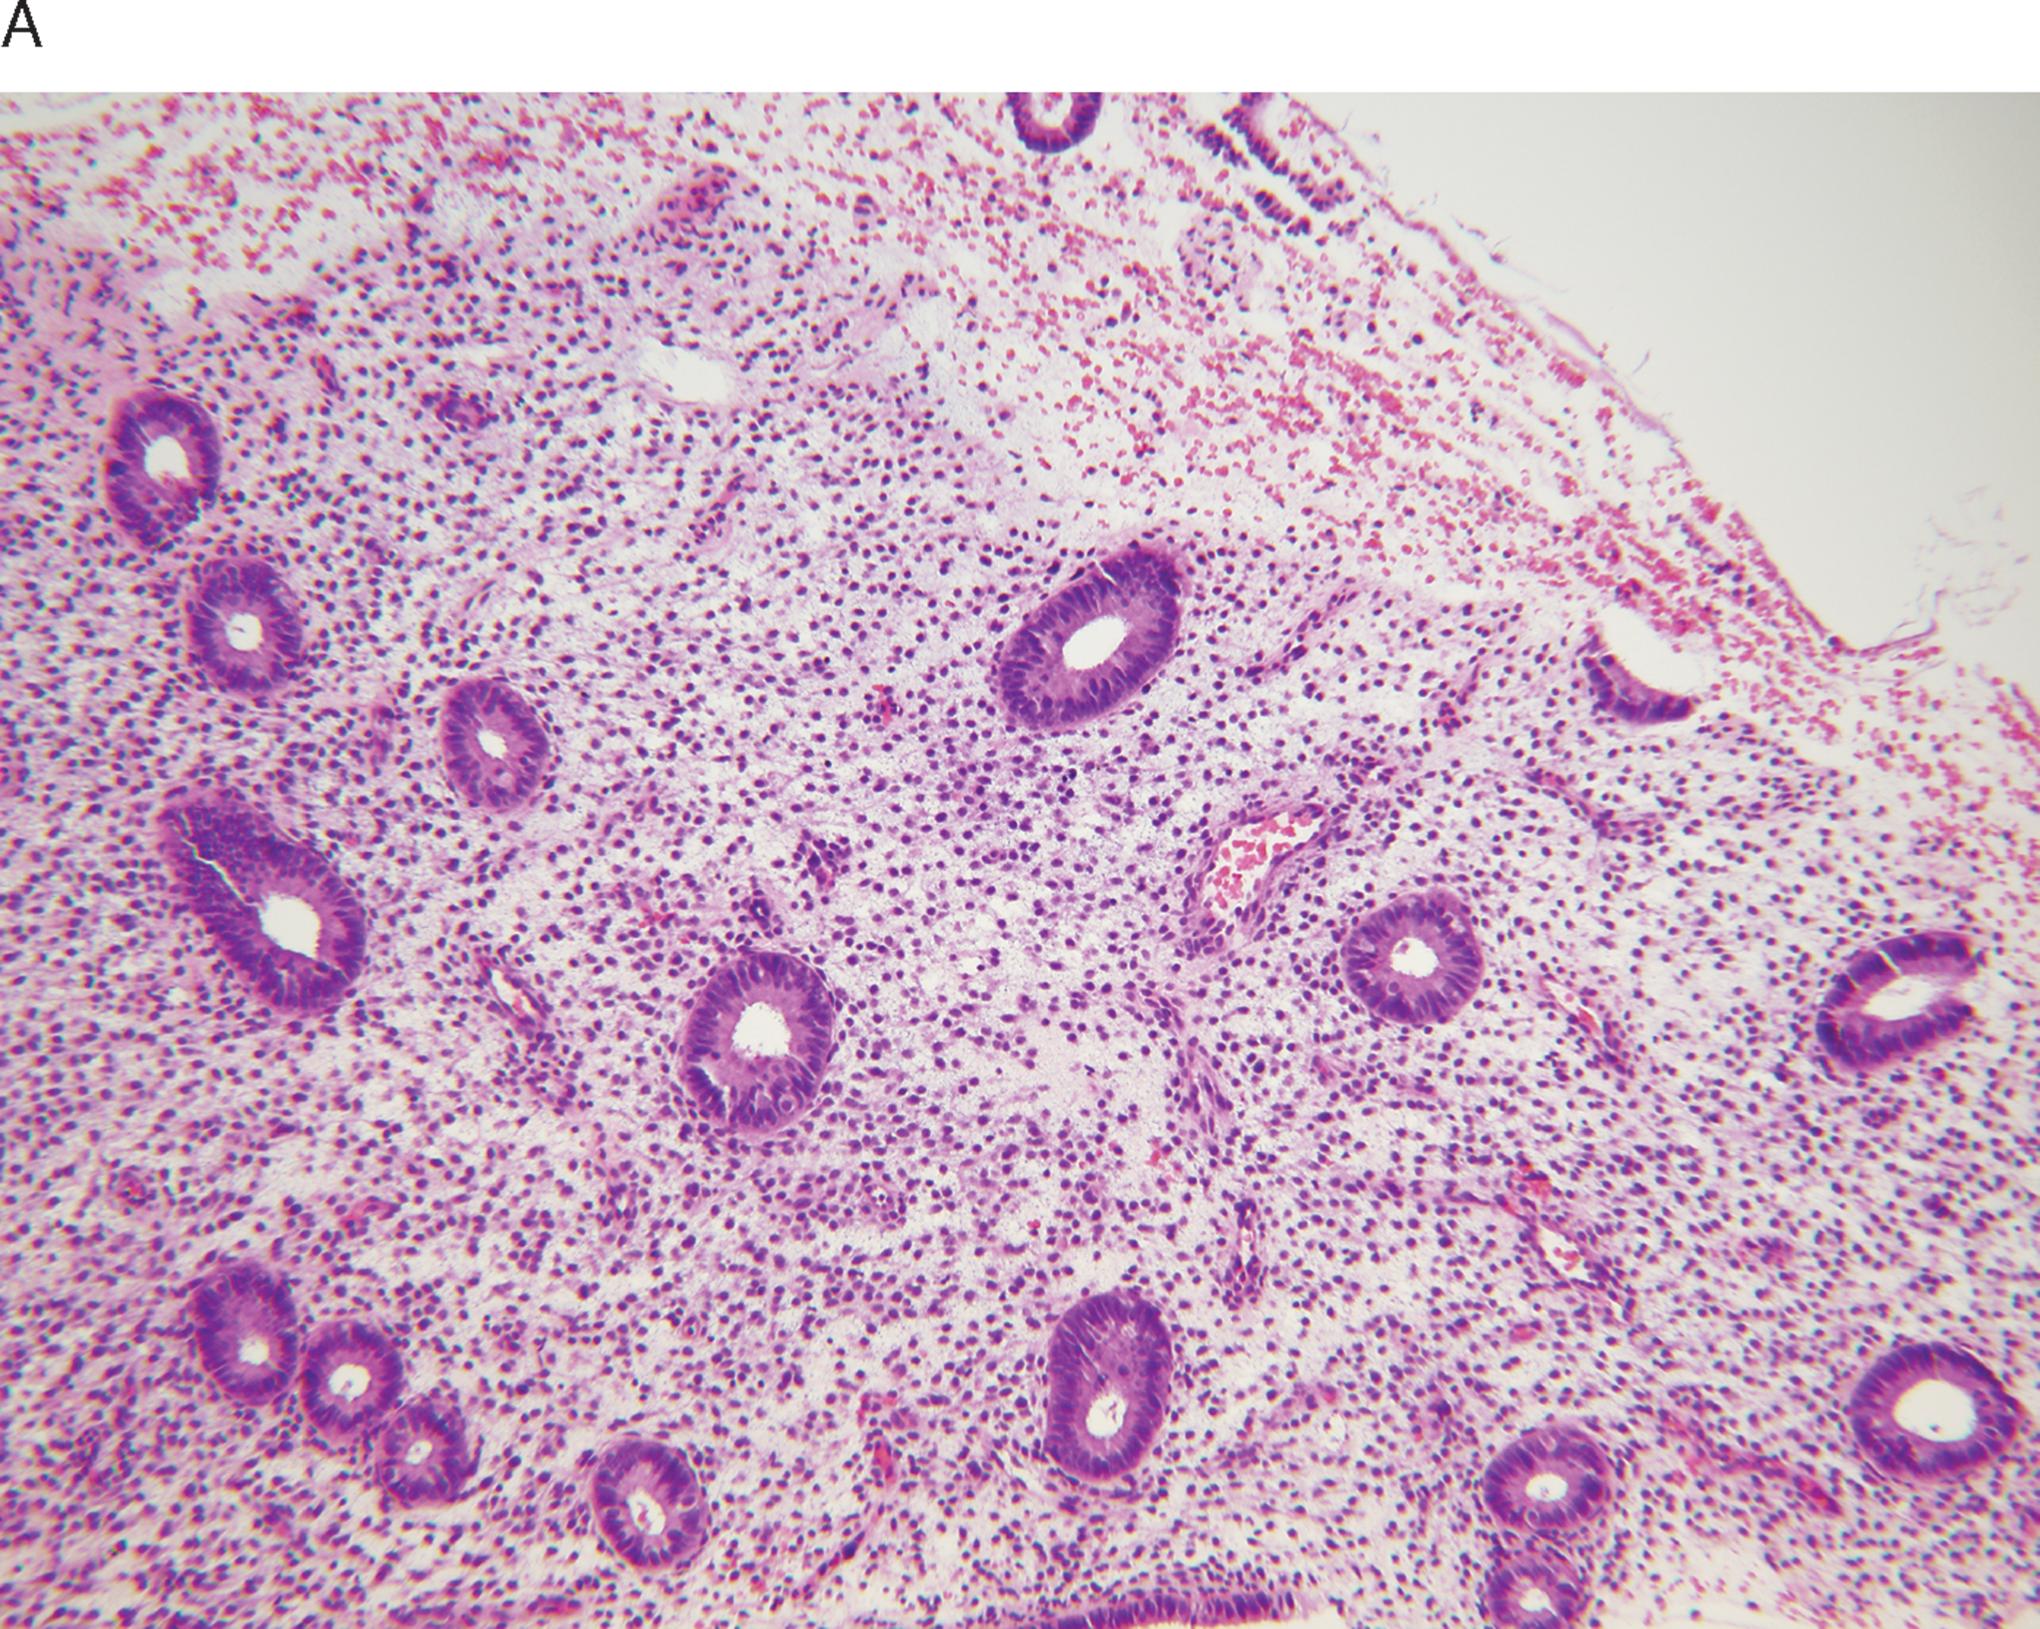 Endometrium biopsy result proliferative Endometrial Biopsy